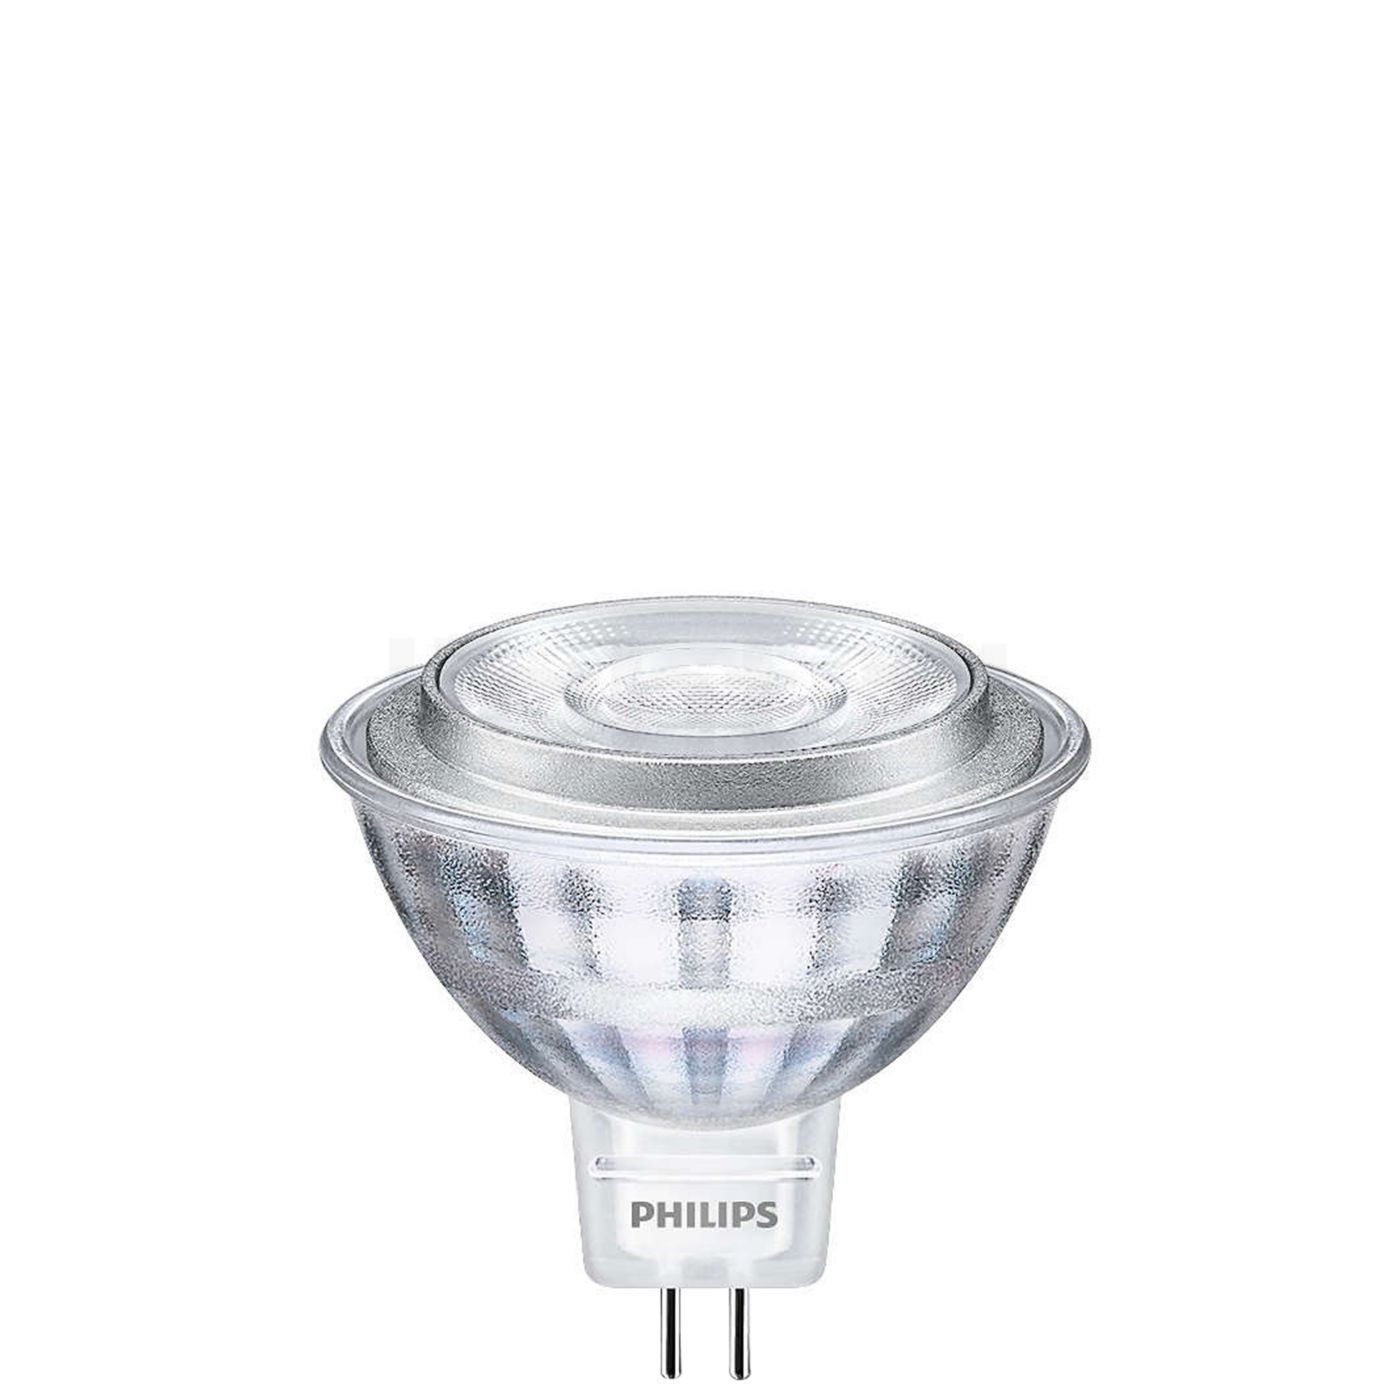 Philips_R_CBC50_8W_36Grad_827_GU5_3_12V--f1a15f864e263feb53974500b9809a6c Faszinierend Led Leuchtmittel 12v Gu5.3 Dekorationen